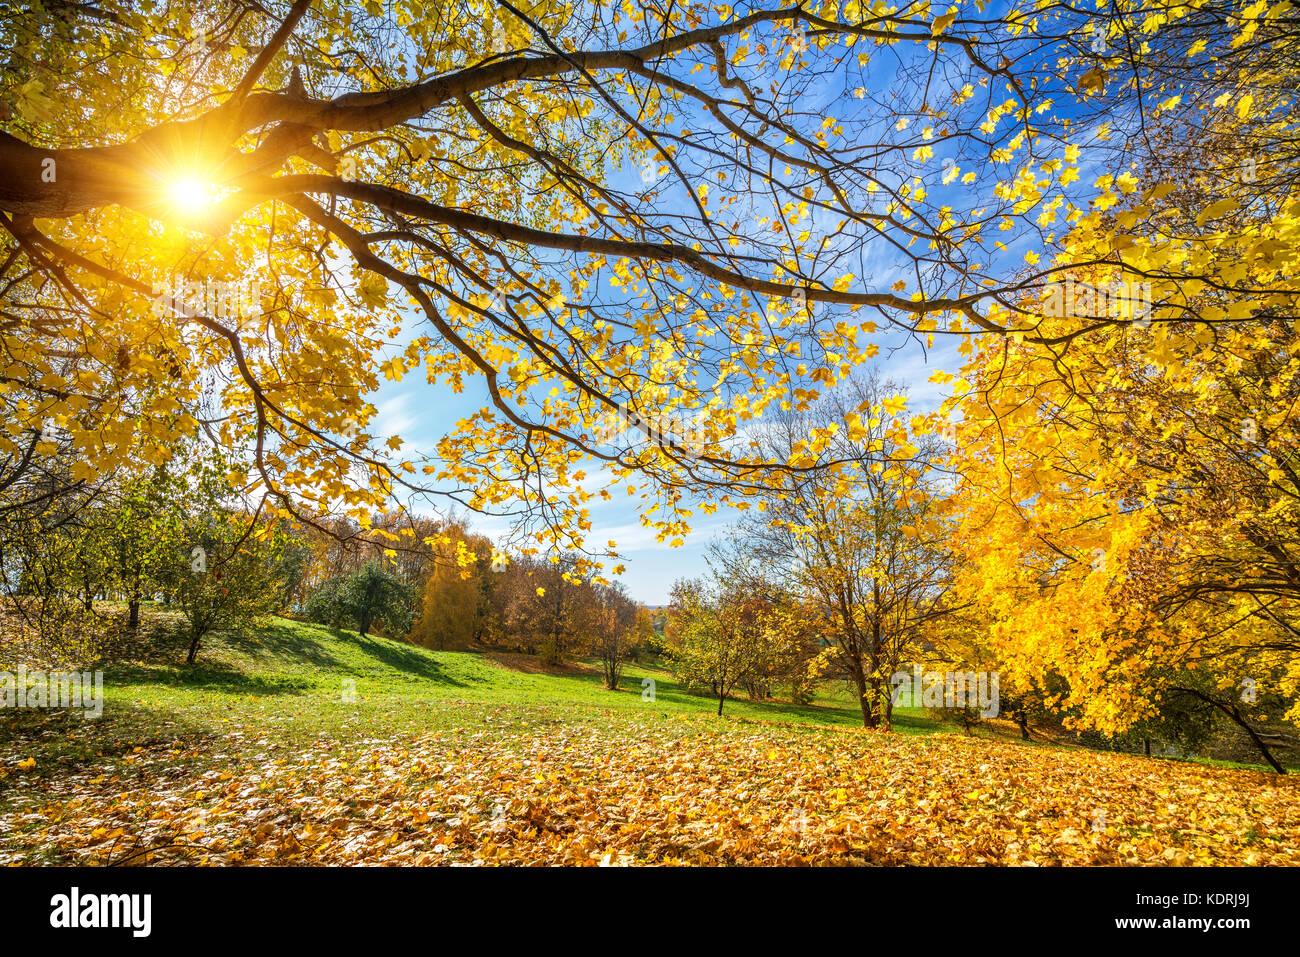 Sonnige Herbst in der Landschaft Stockbild